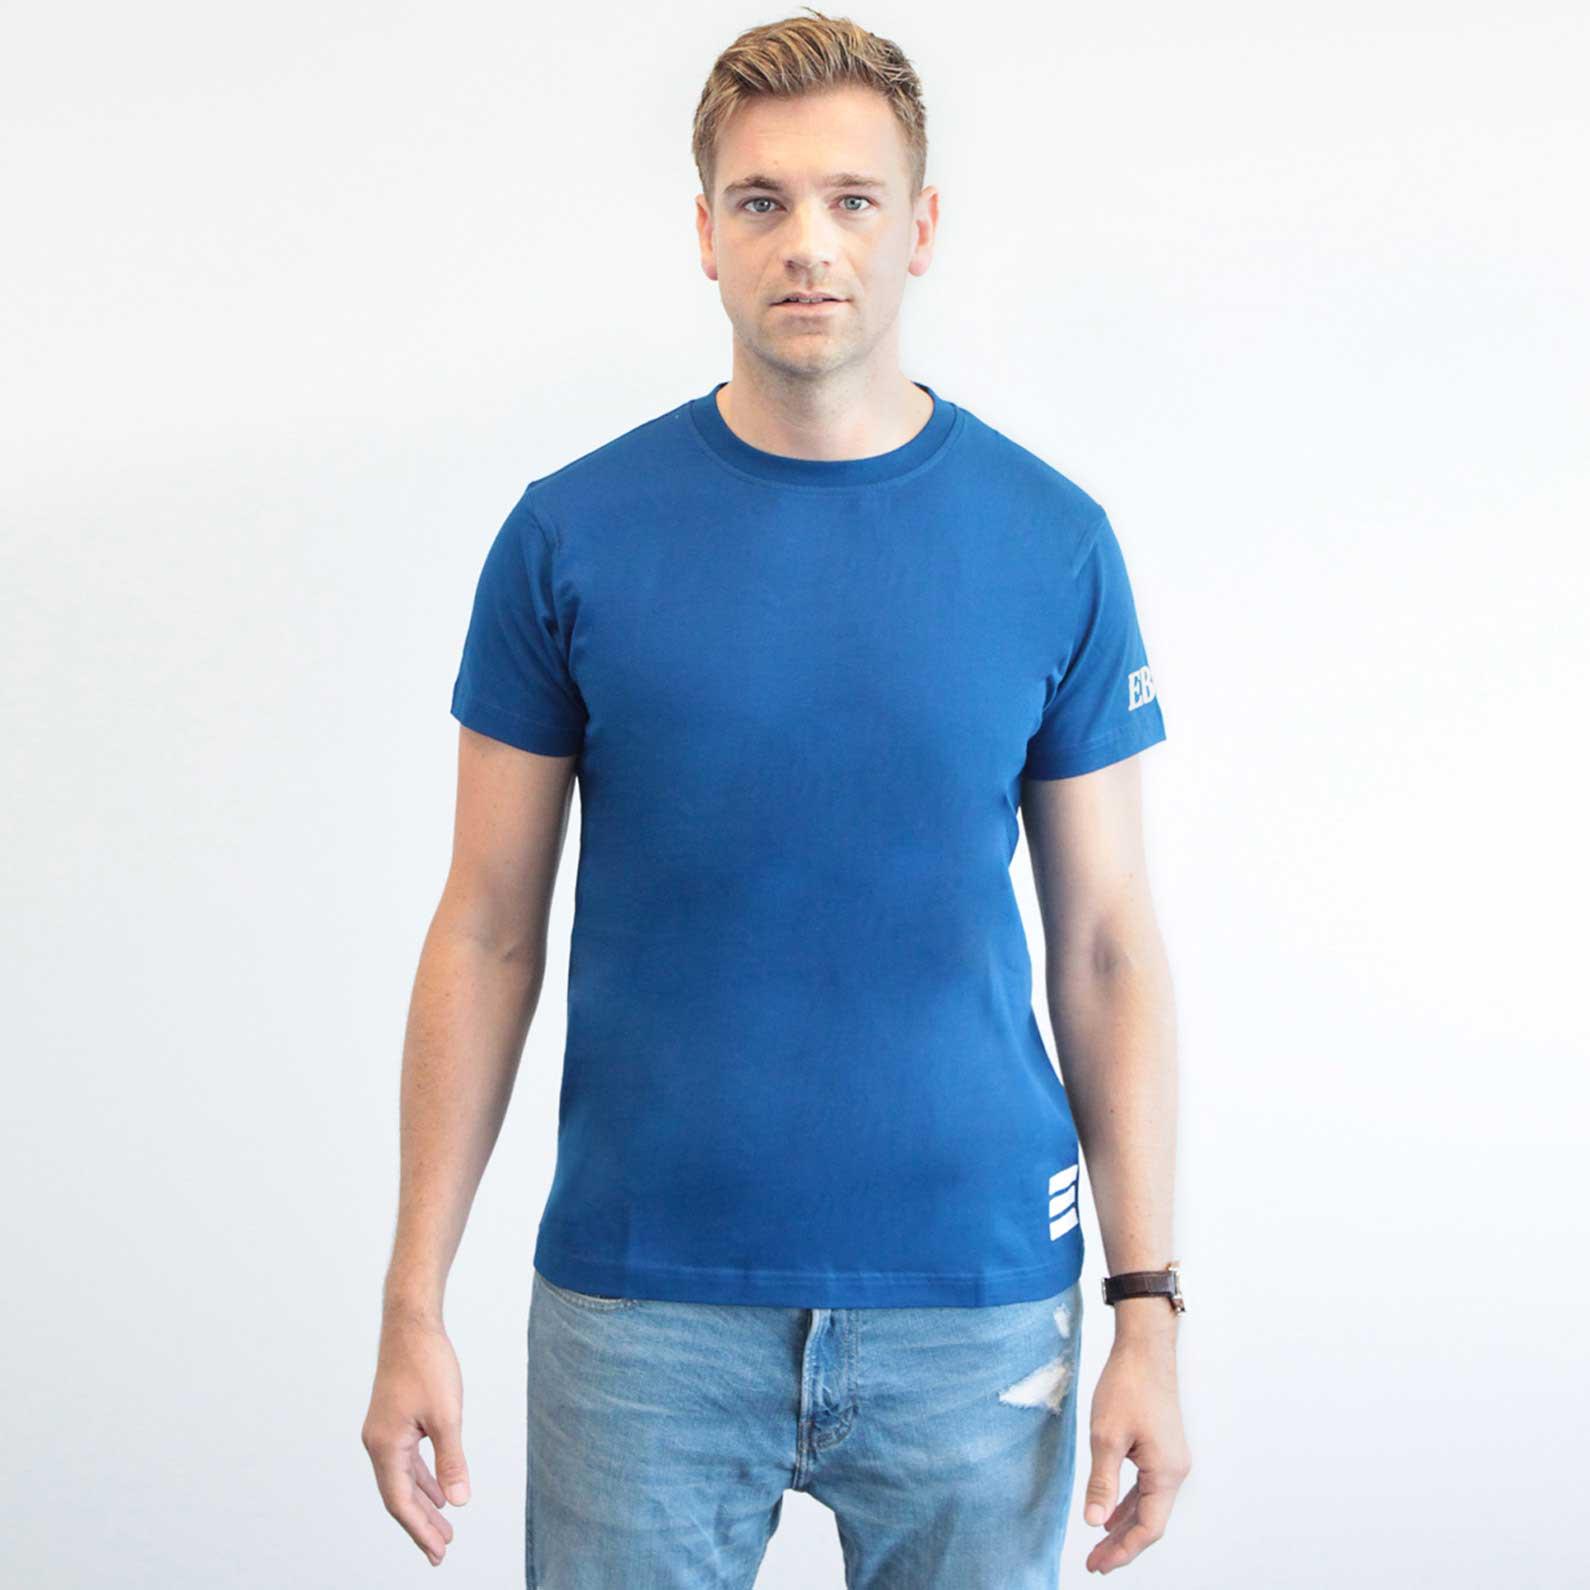 T-Shirt Herren XXL